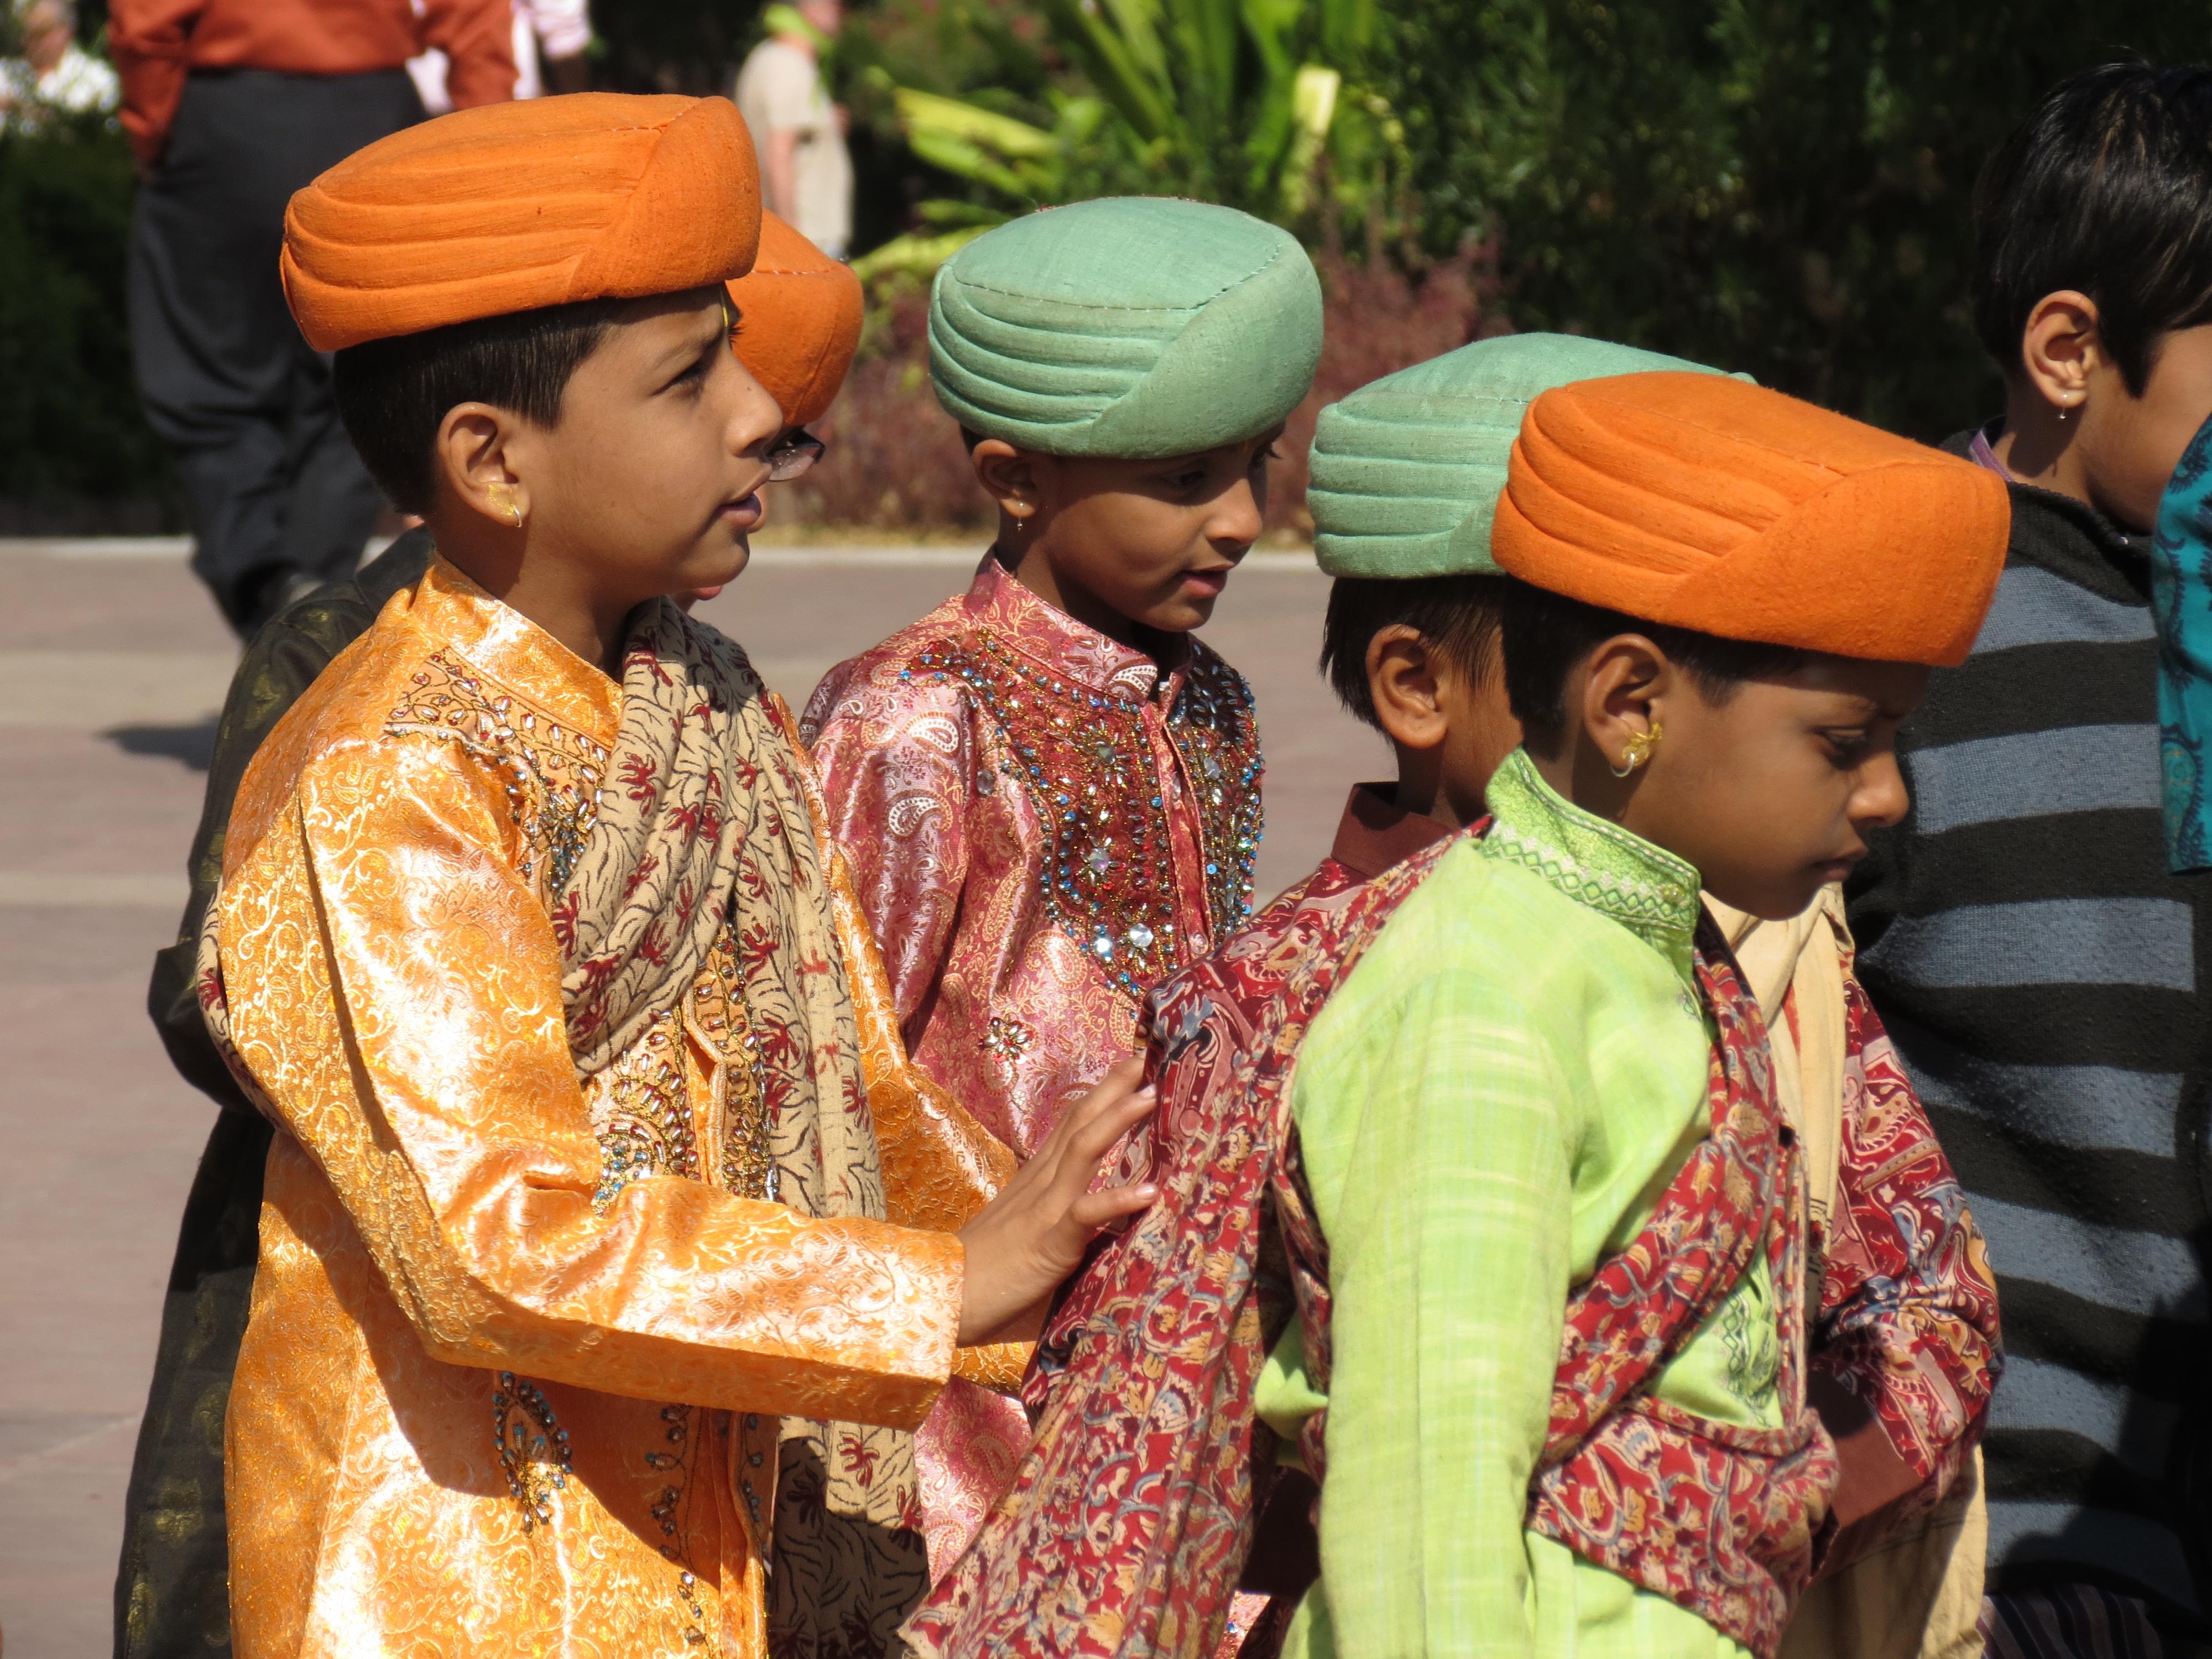 Luca Errera, Daniela Trastulli, India, Rajasthan, bambini, costumi